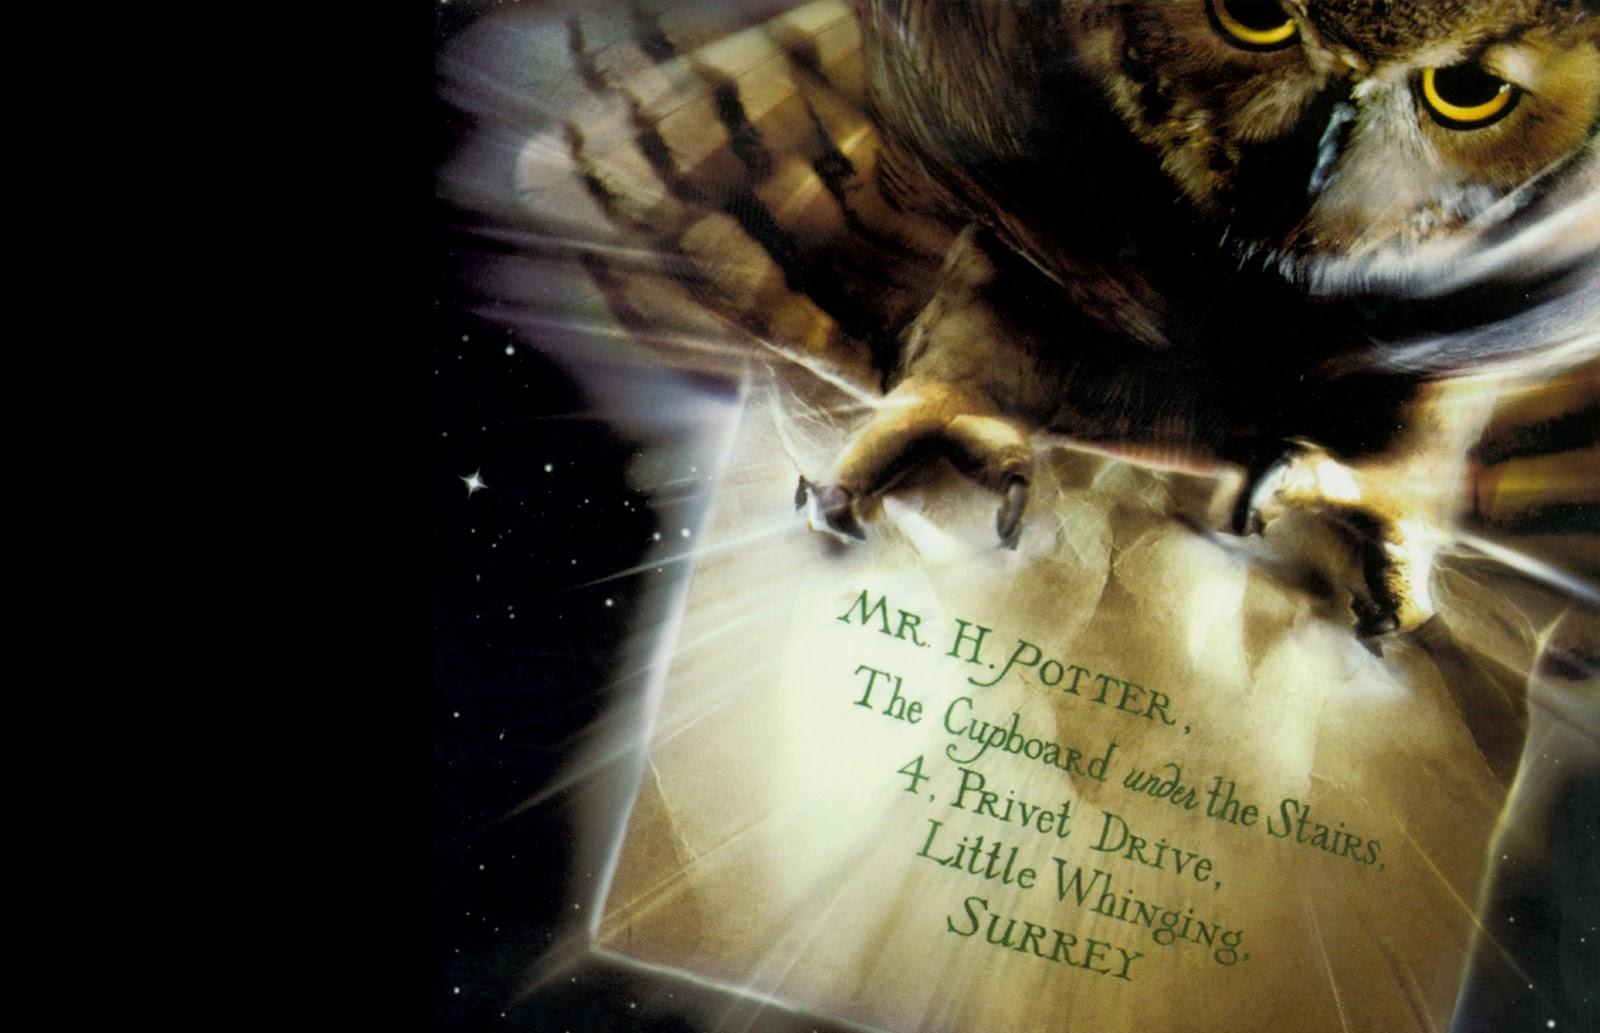 Fantastic Wallpaper Harry Potter Letter - wallpaper%2Bcoruja%2Bharry%2Bpotter  Collection_489680.jpg